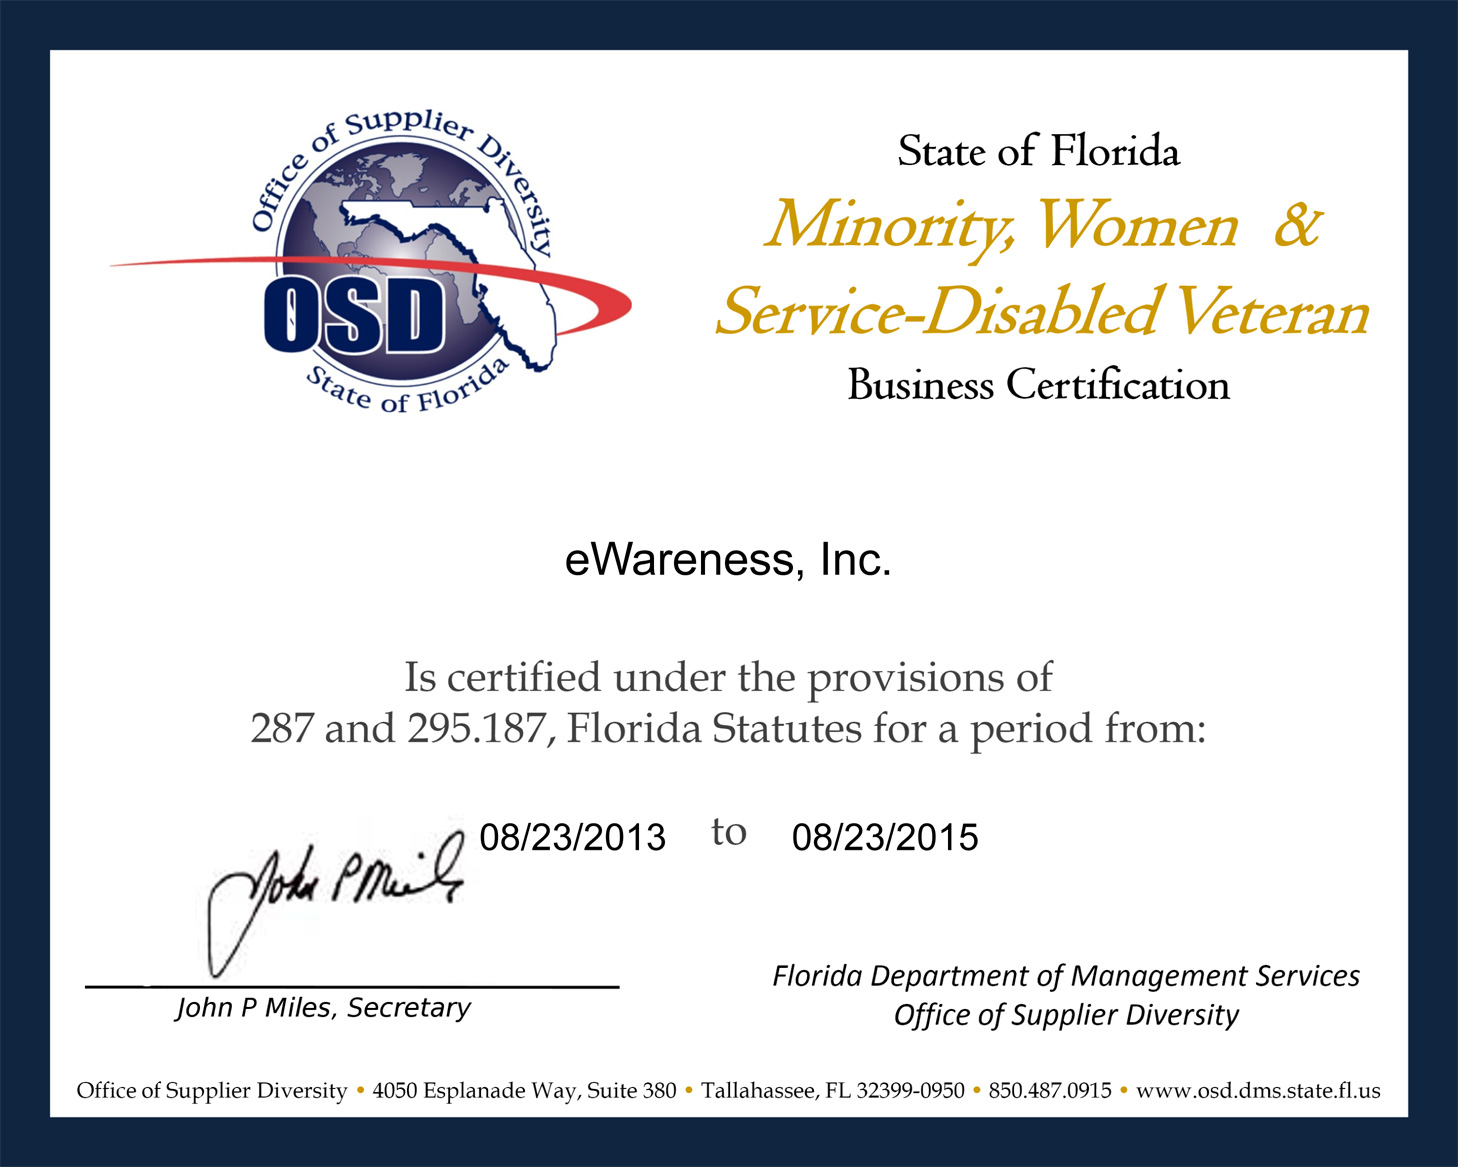 eWareness-Florida-OSD-MBE-Certificate